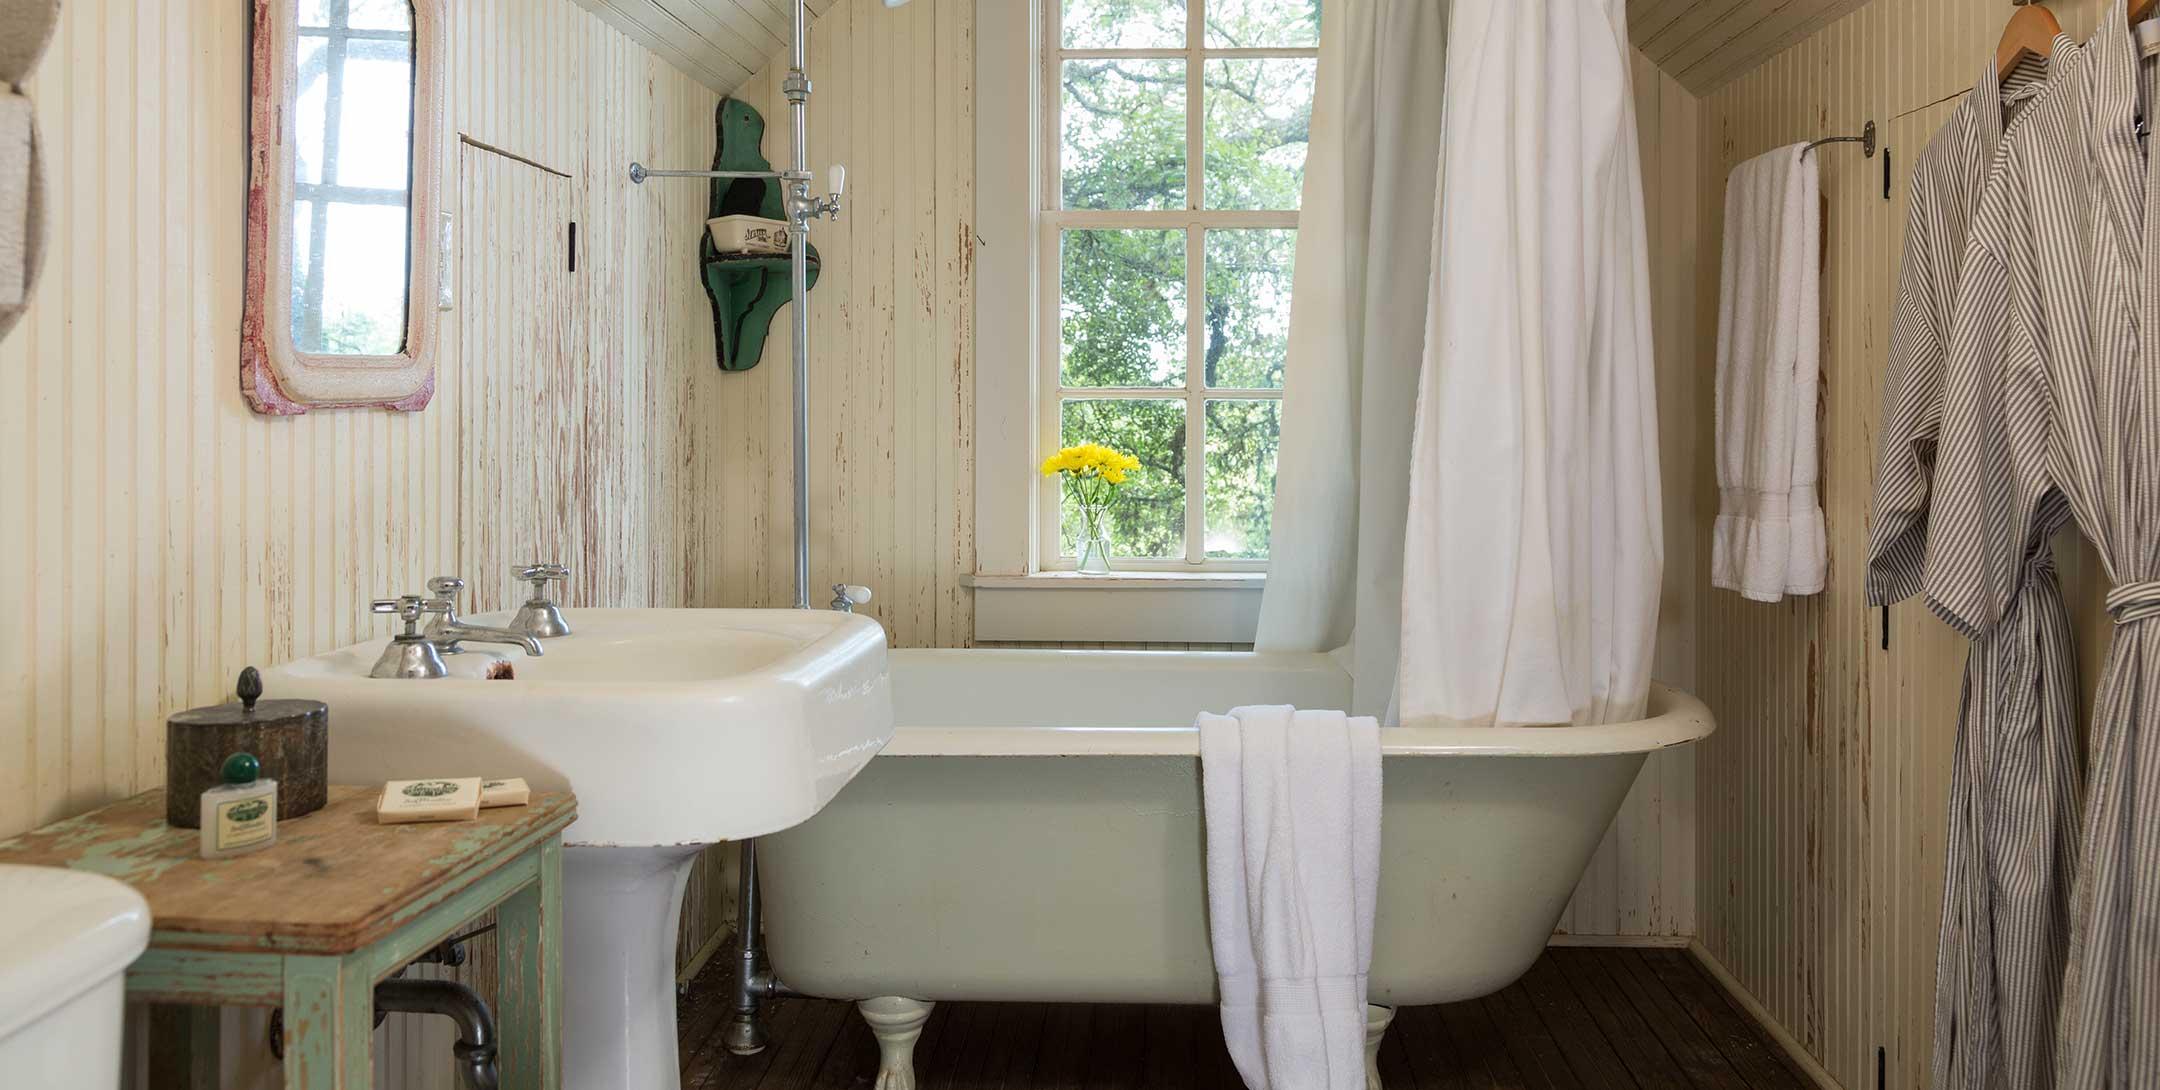 Texas Farm House bath with claw-foot tub